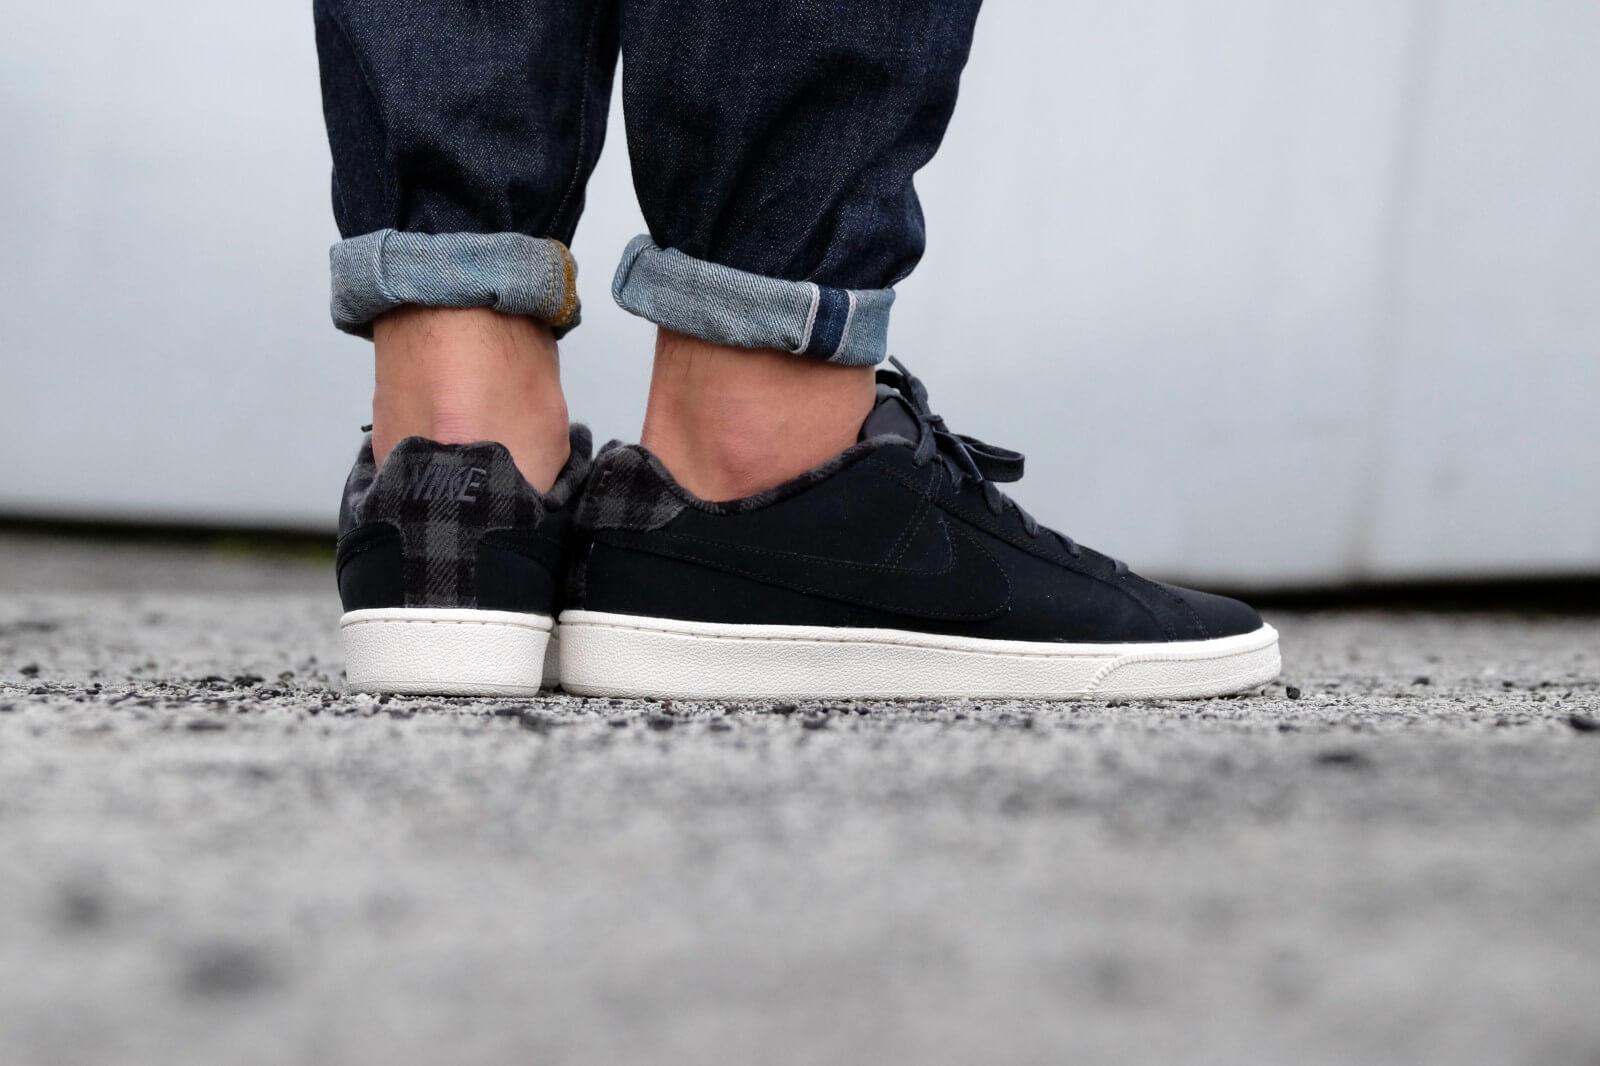 Nike Court Royale Premium Black/Black - Anthracite - Phantom